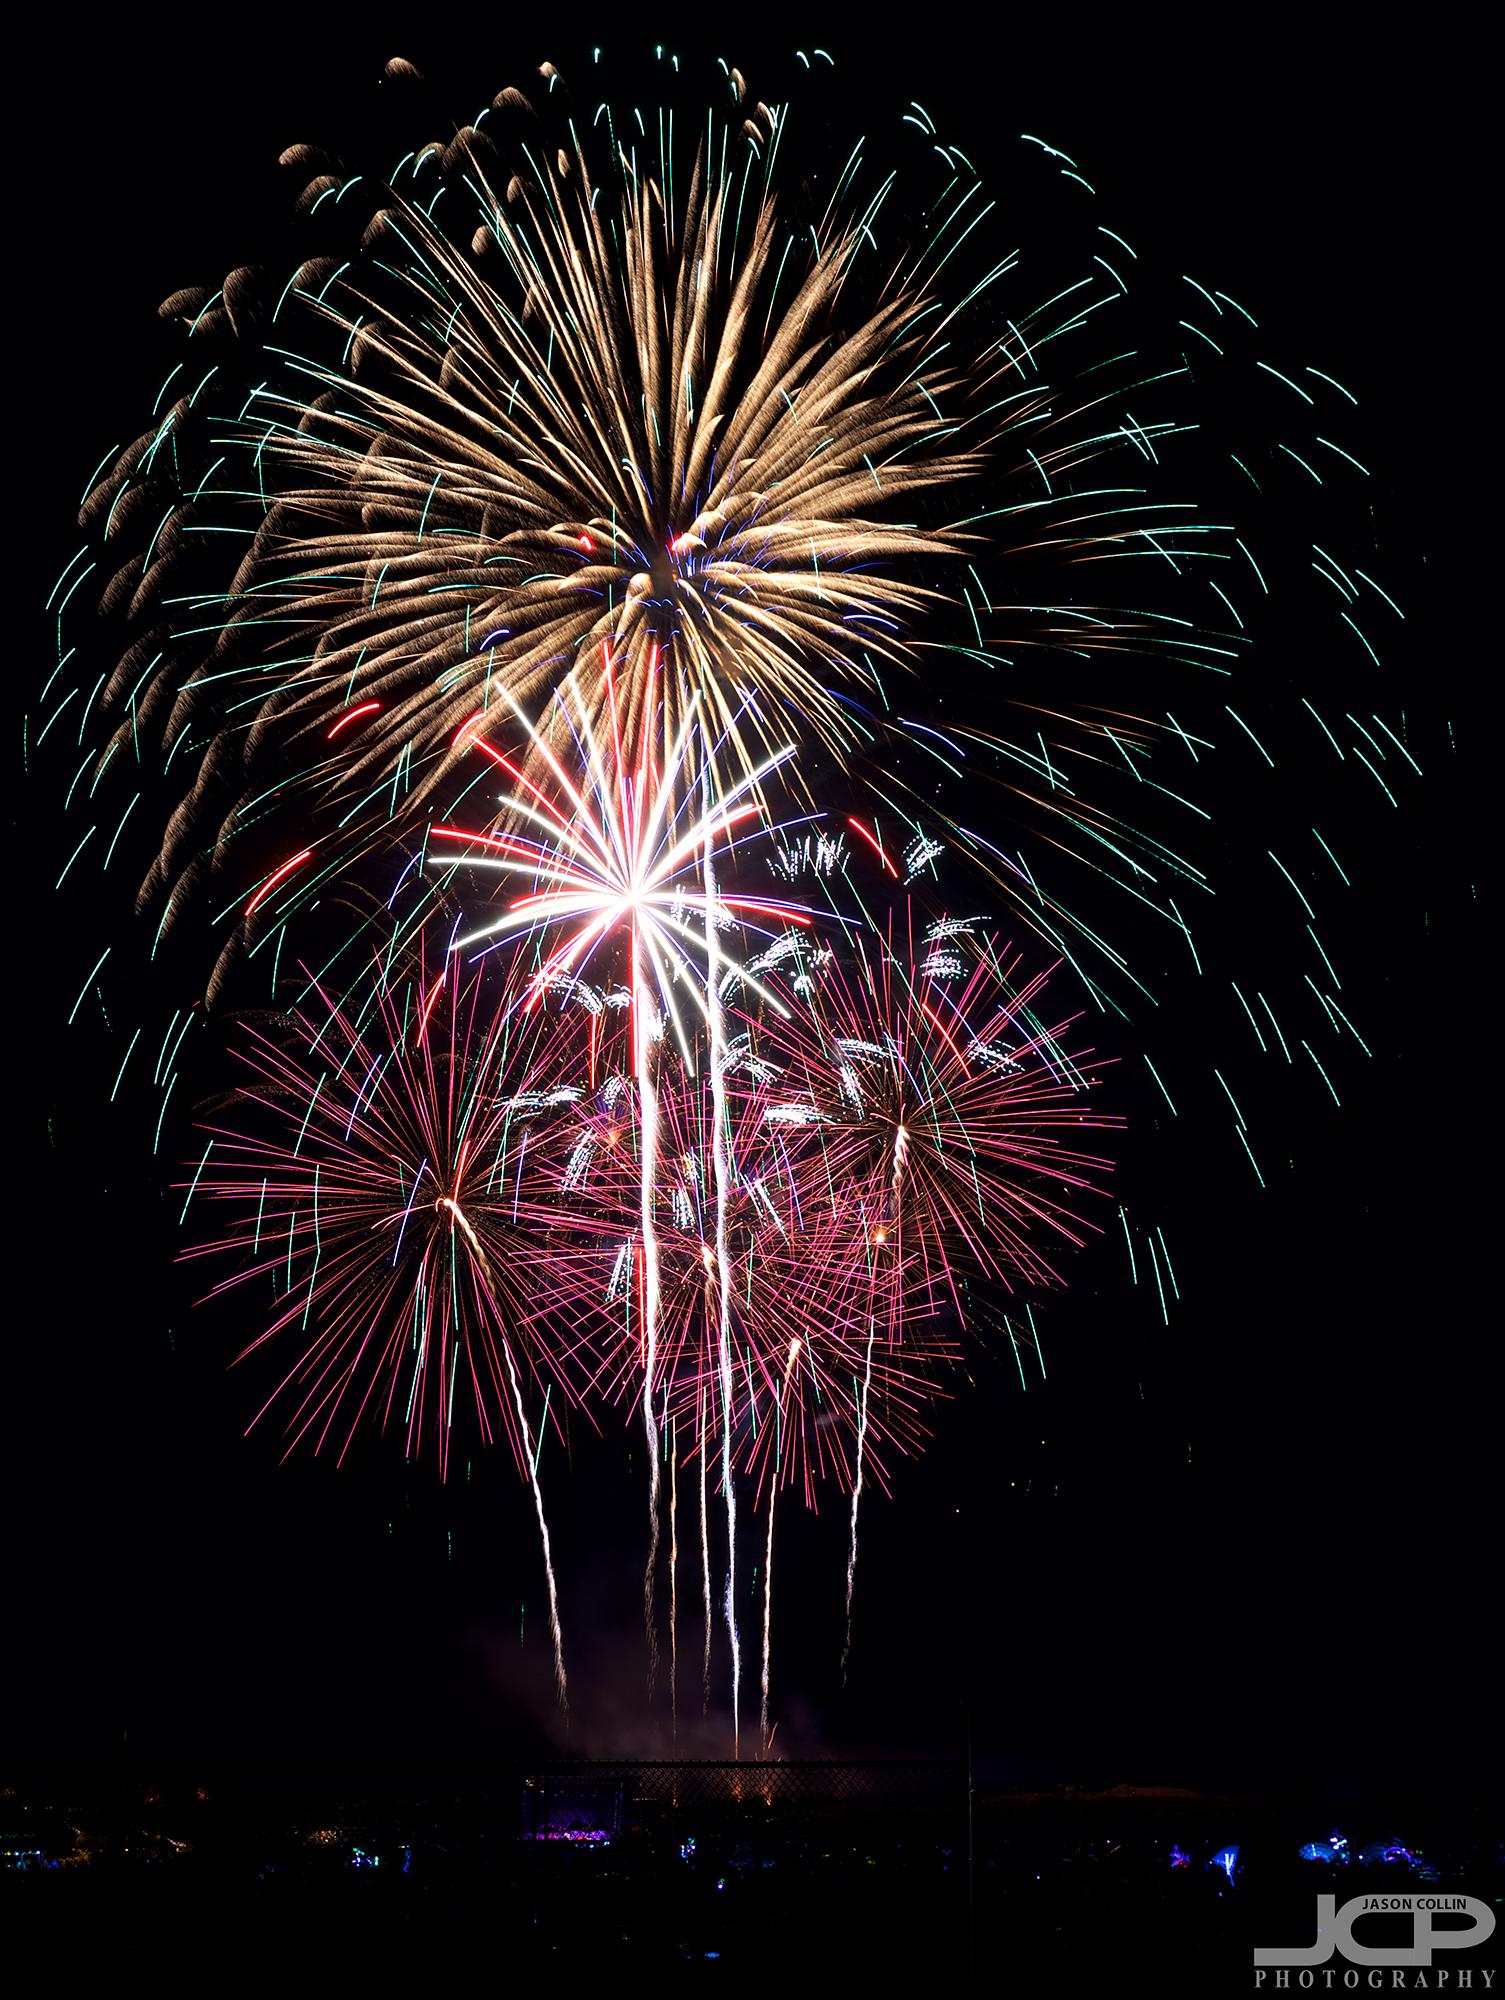 fireworks-7-04-2019-abq-131742.jpg